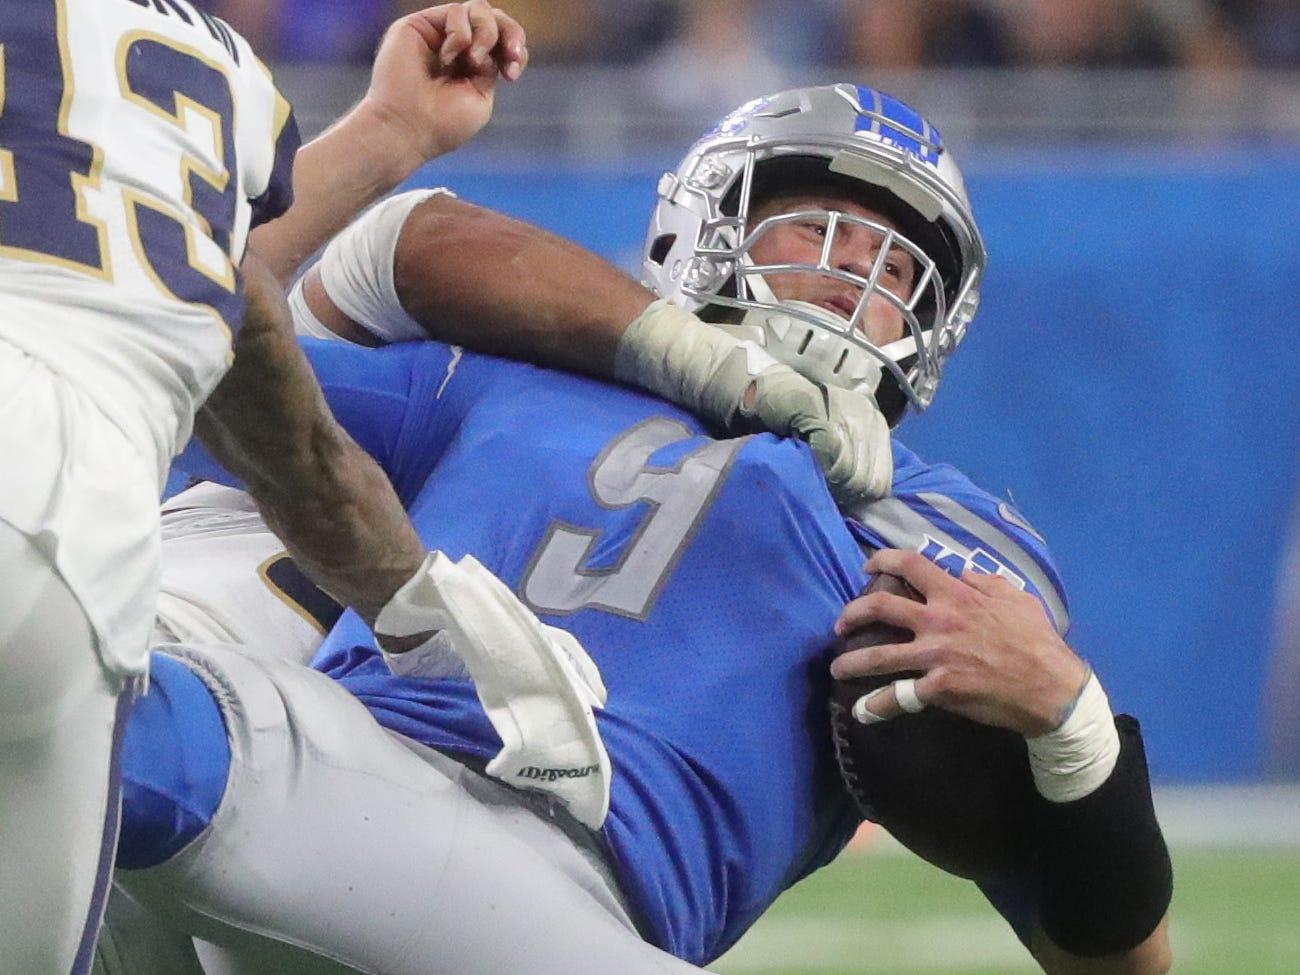 Detroit Lions: Back injury postpones Matthew Stafford's media availability